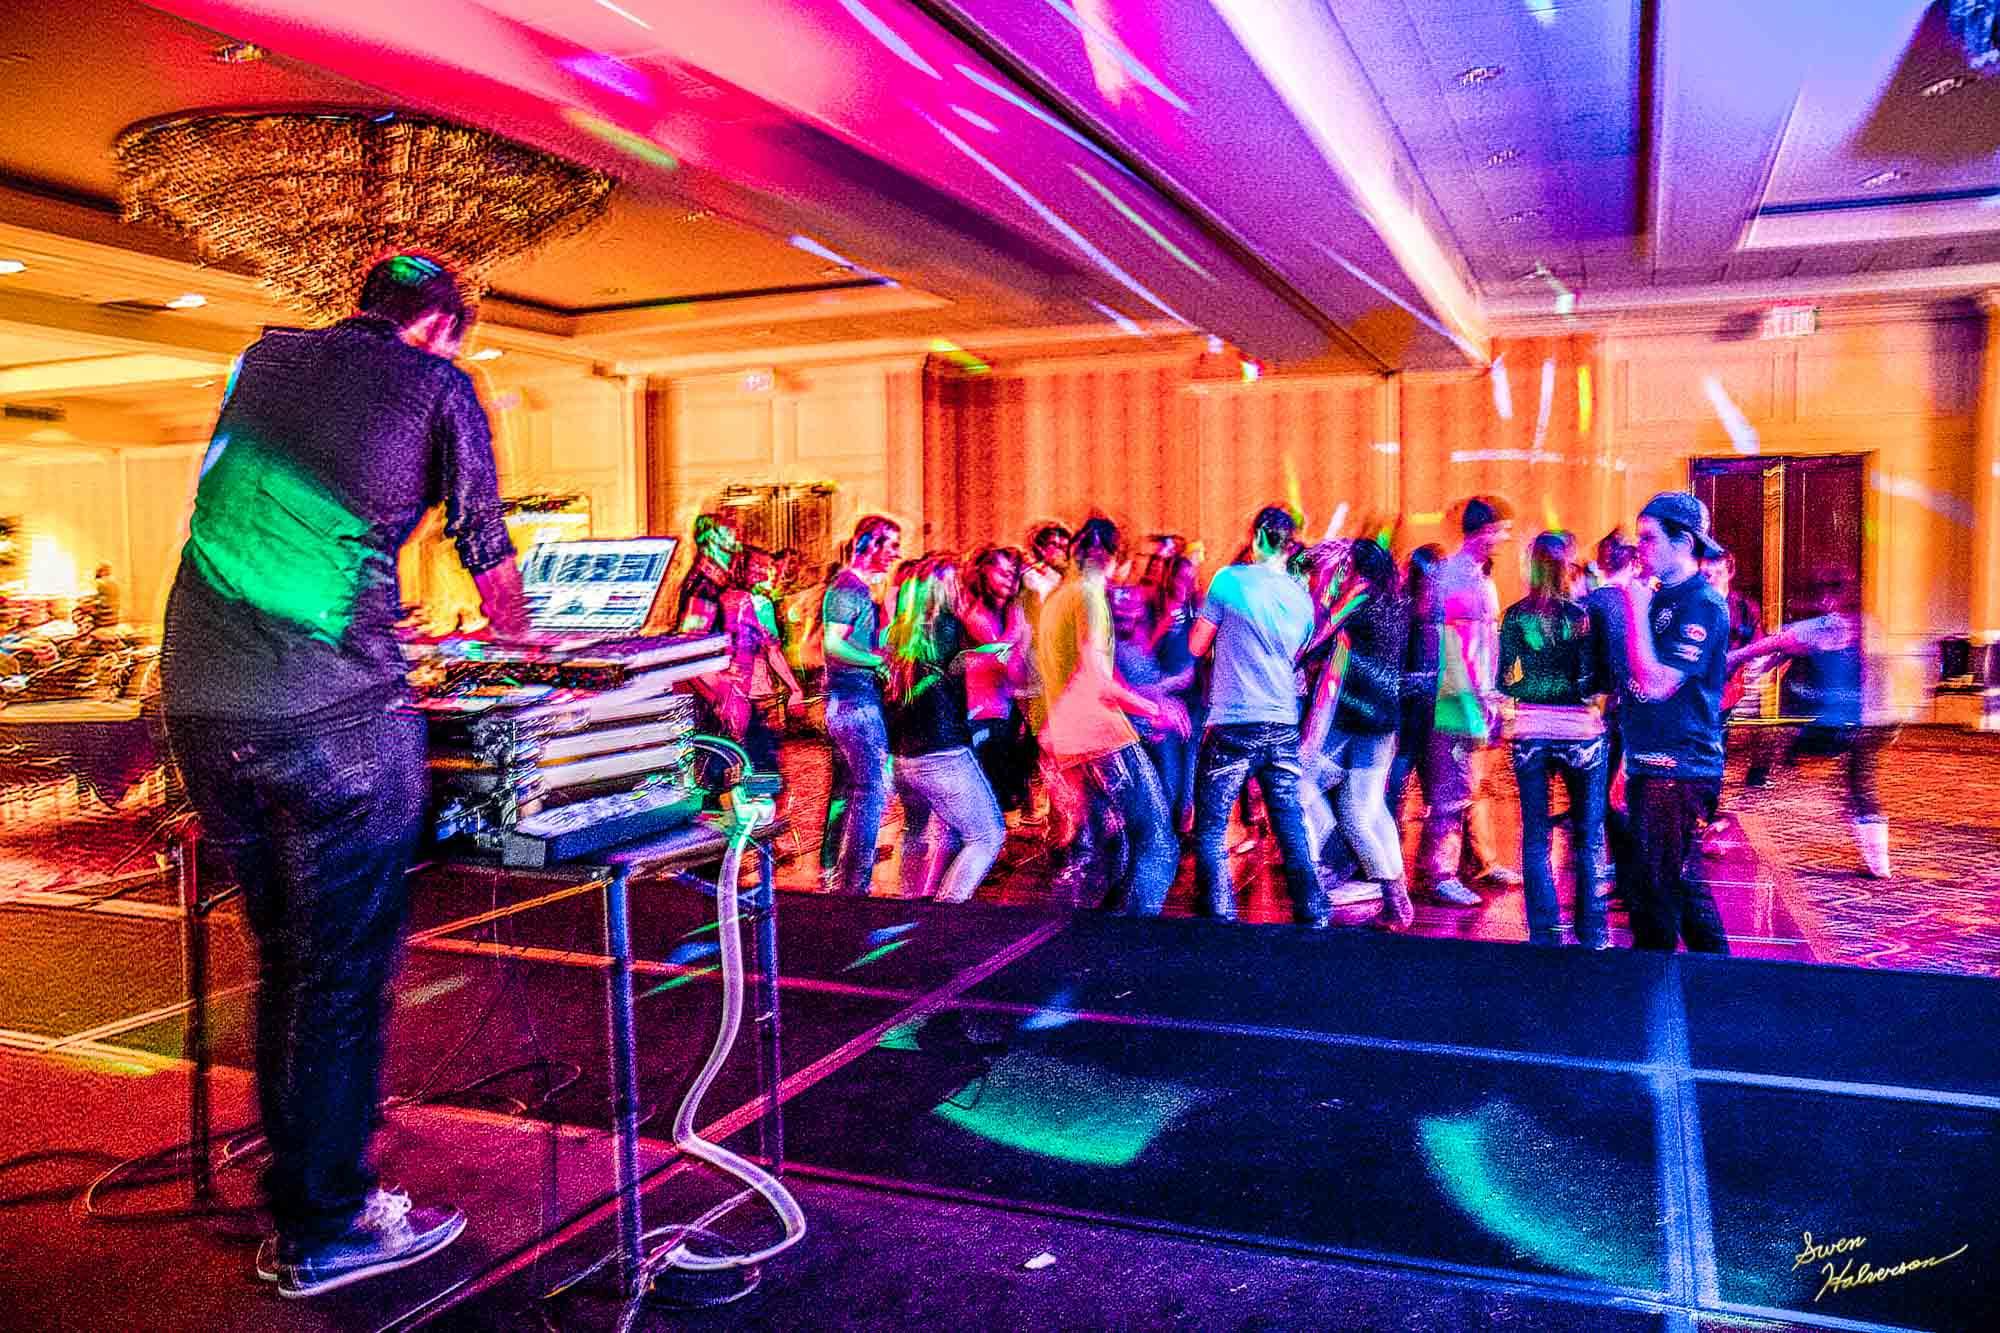 Theme:Dance | Title: Makin' The Groove